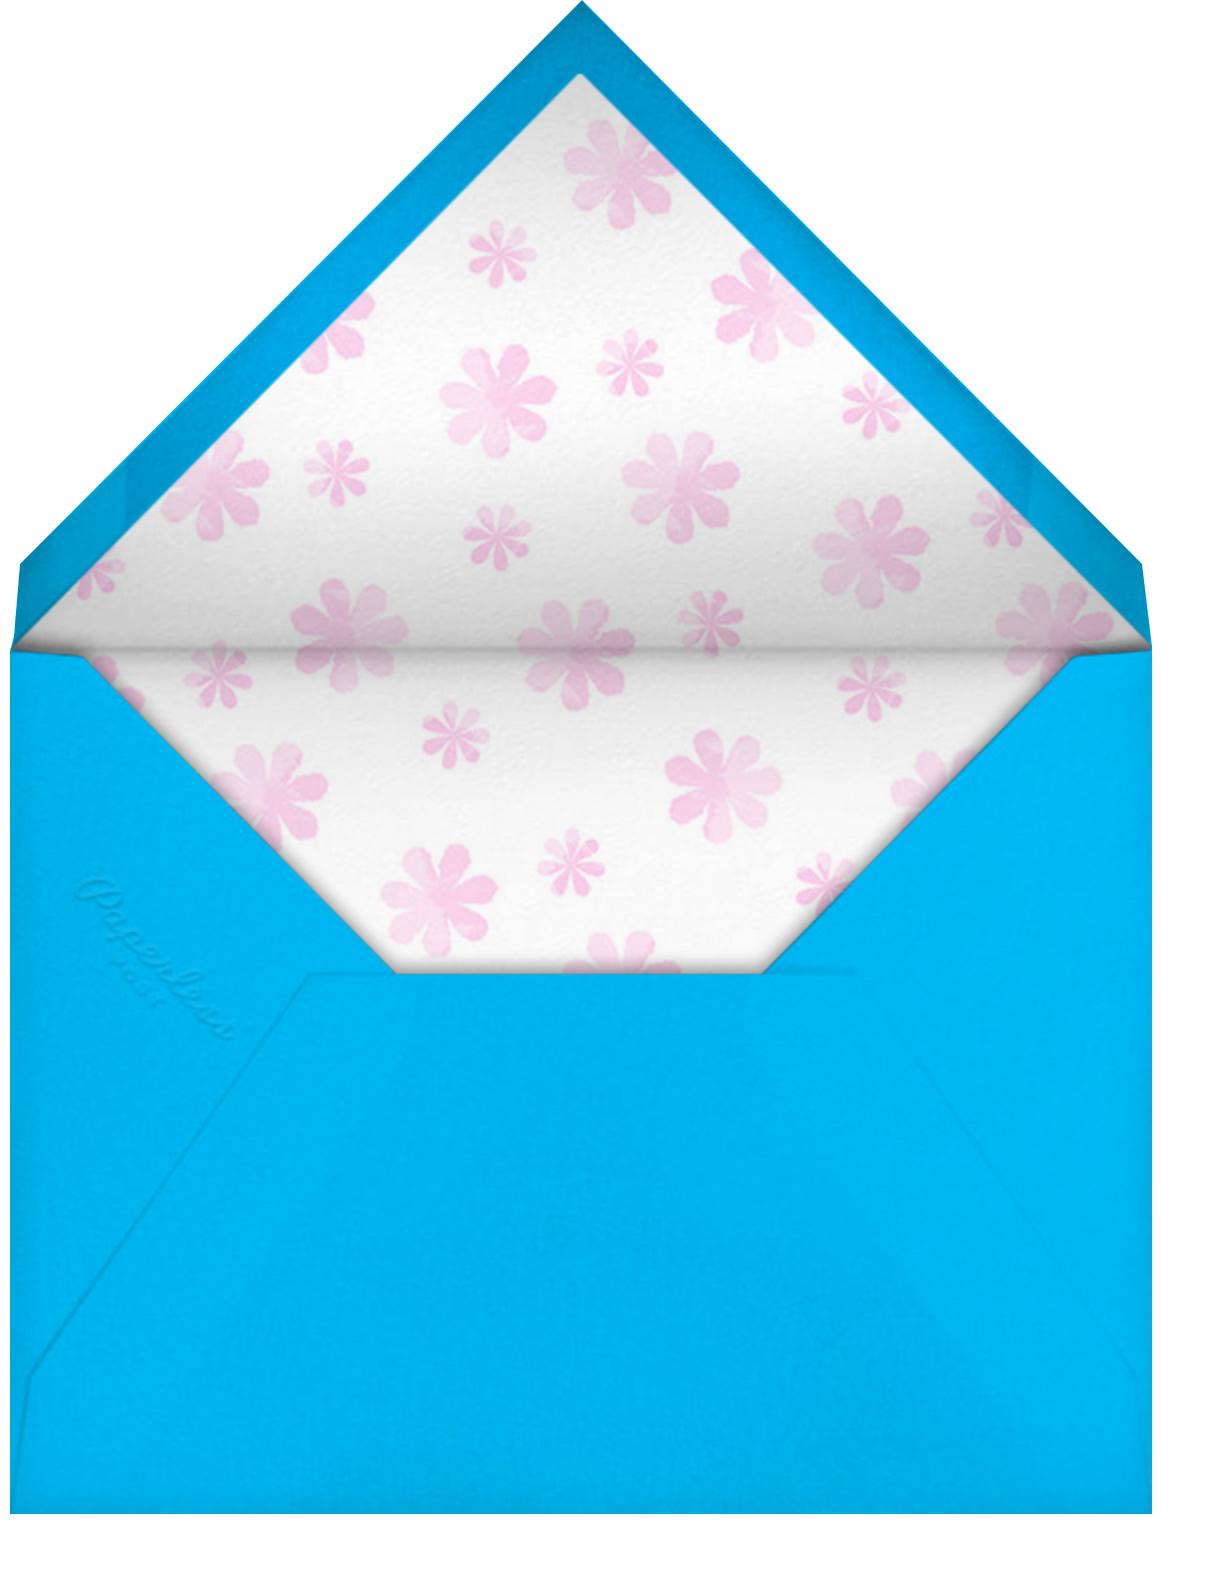 Shaded Pool - Paperless Post - Envelope